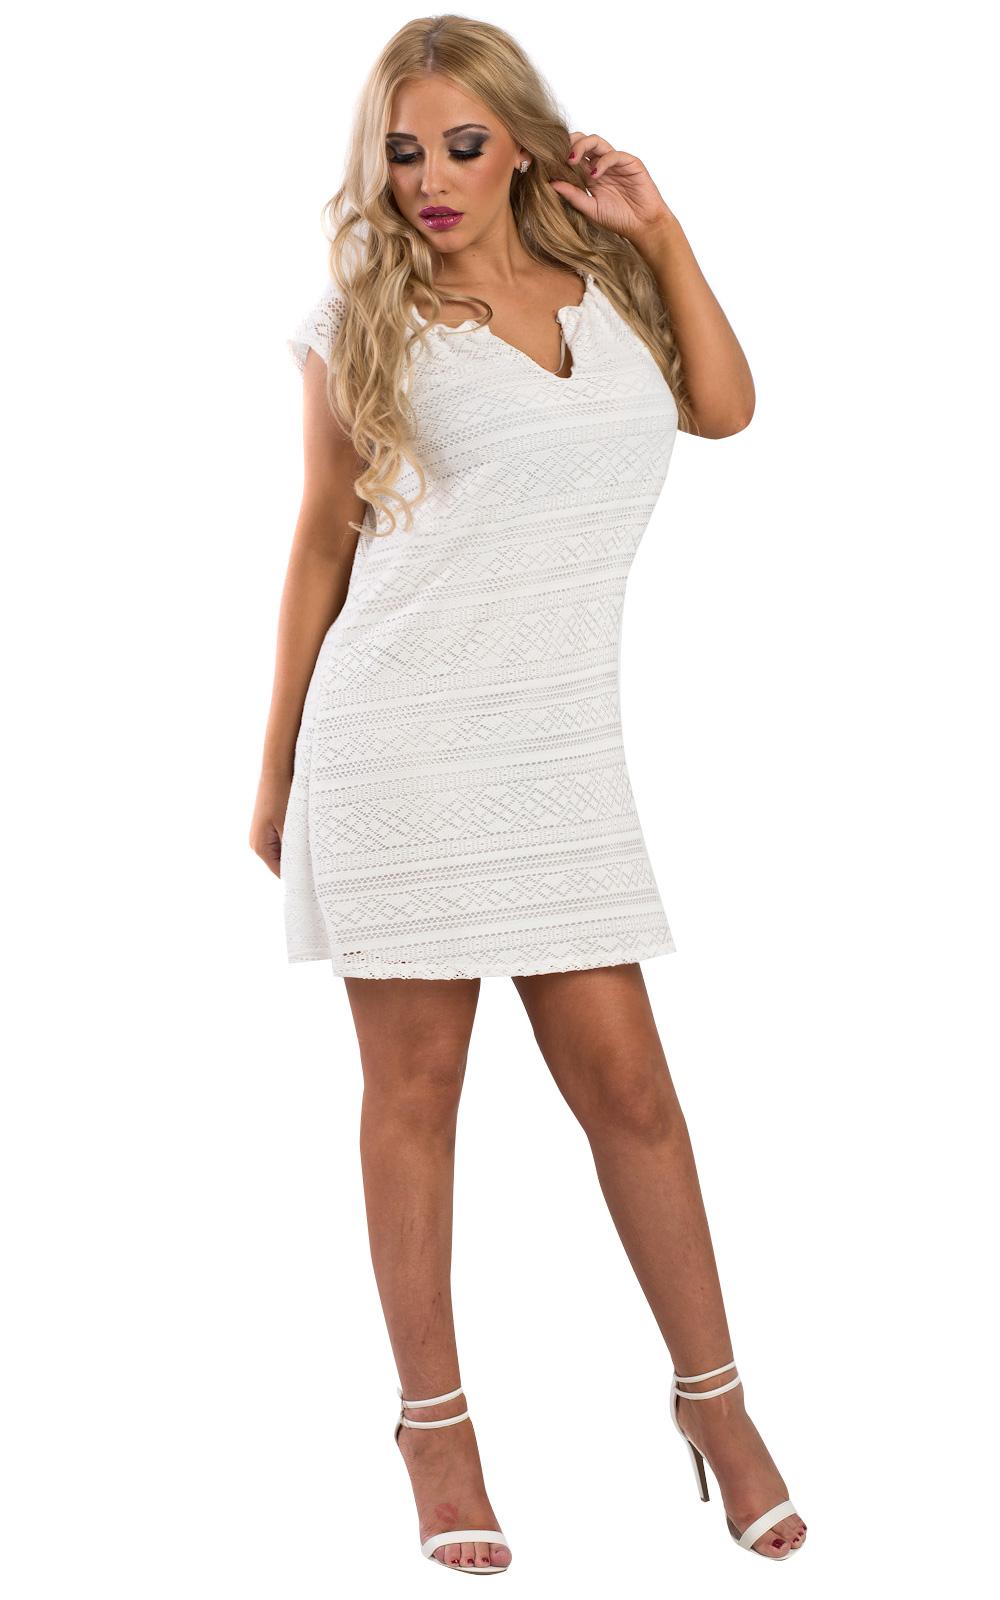 Lace Shift Festival Fashion Style Lace Up Summer Dress Ebay